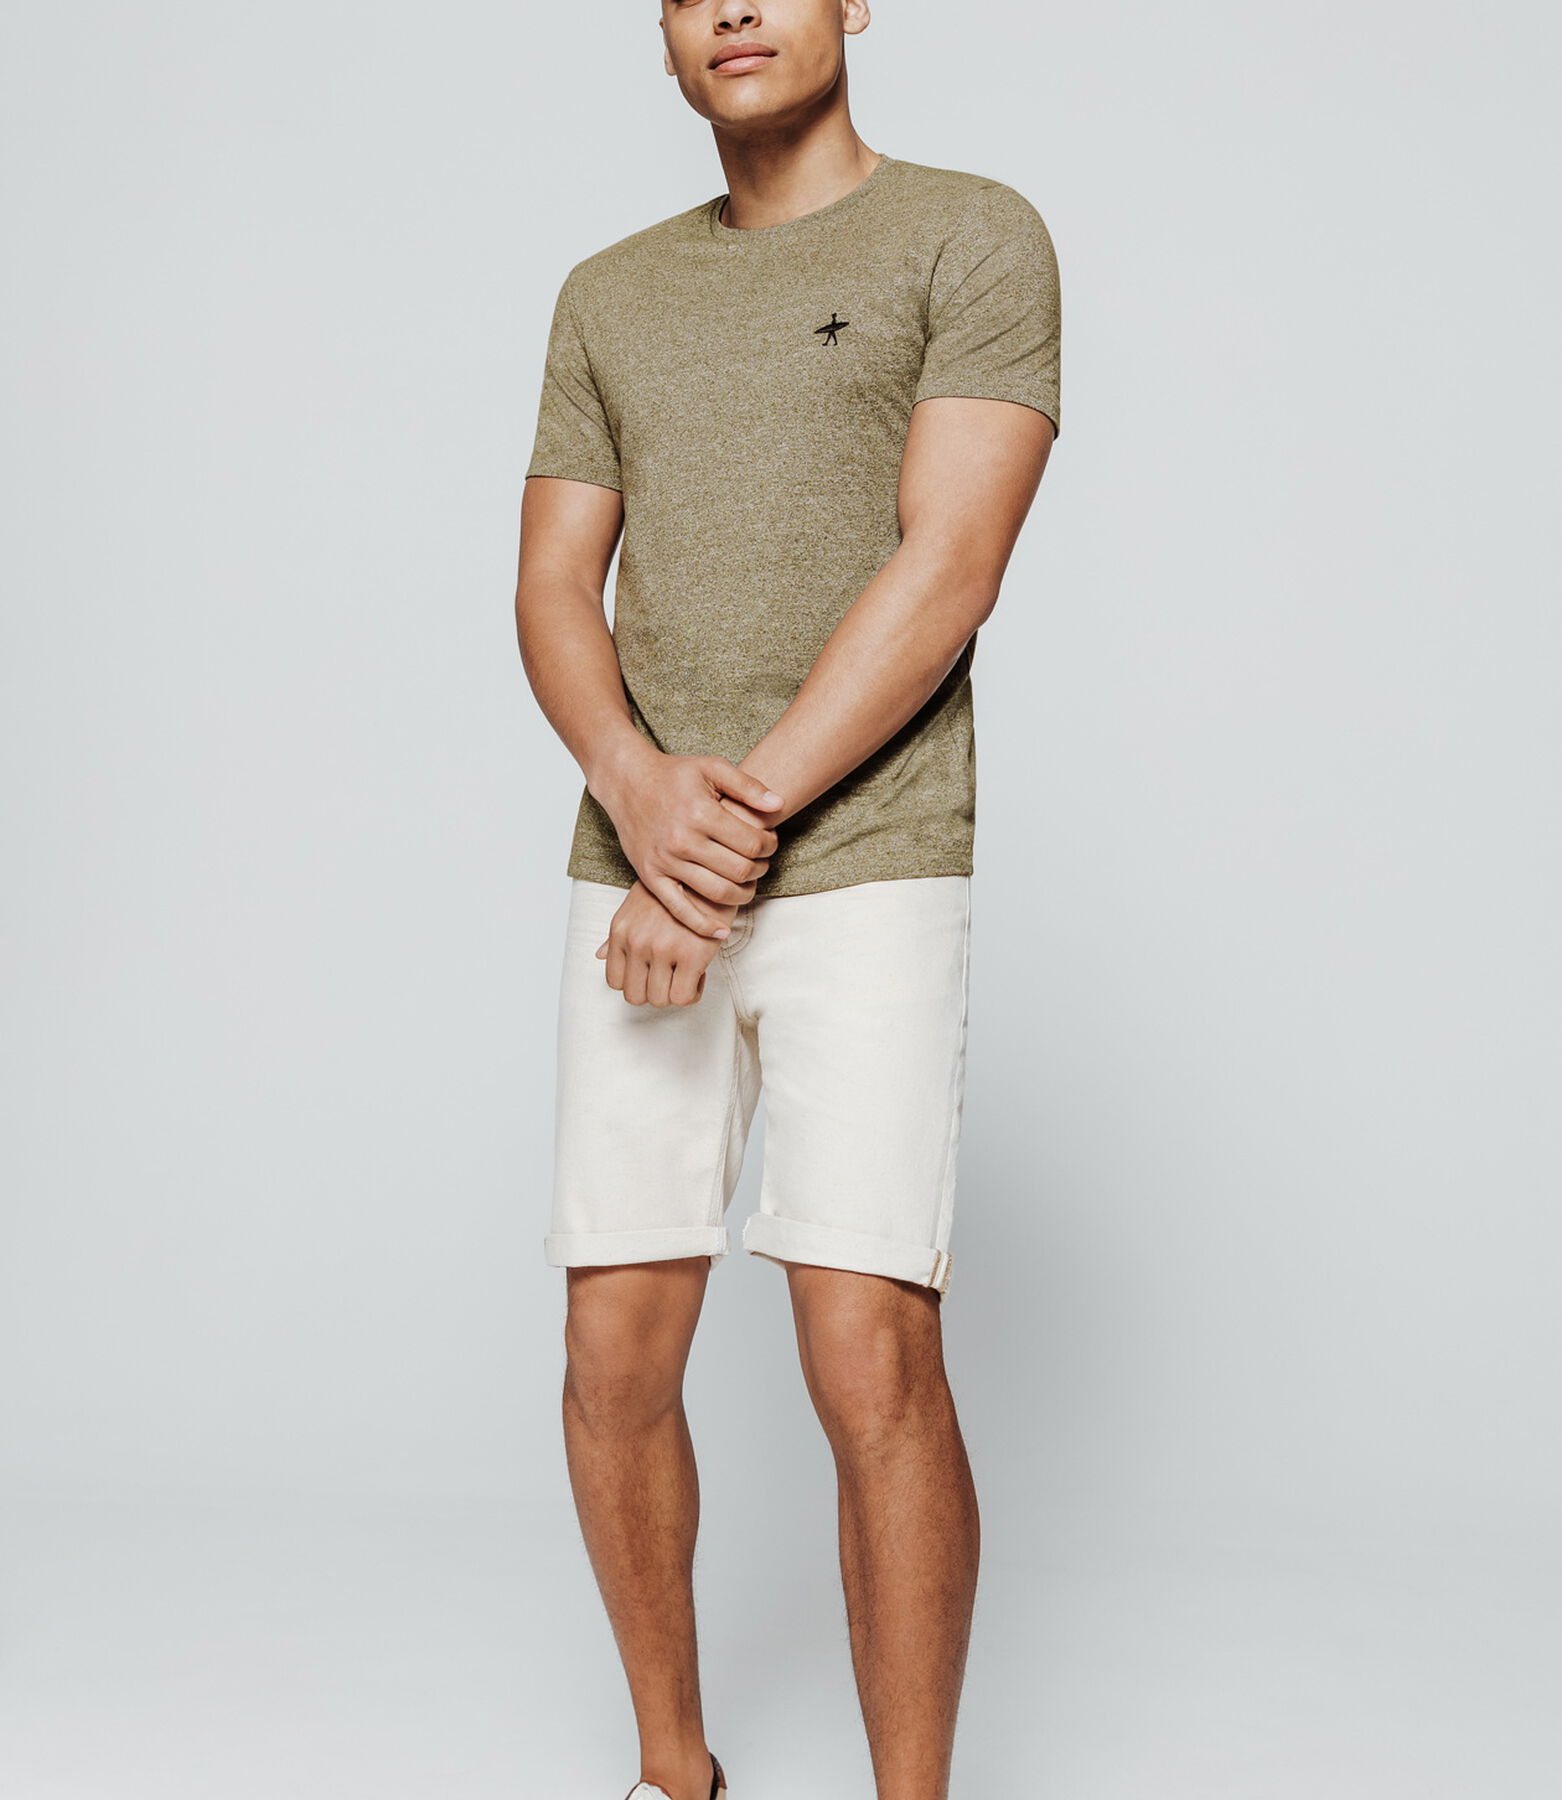 T-shirt mouliné broderie poitrine